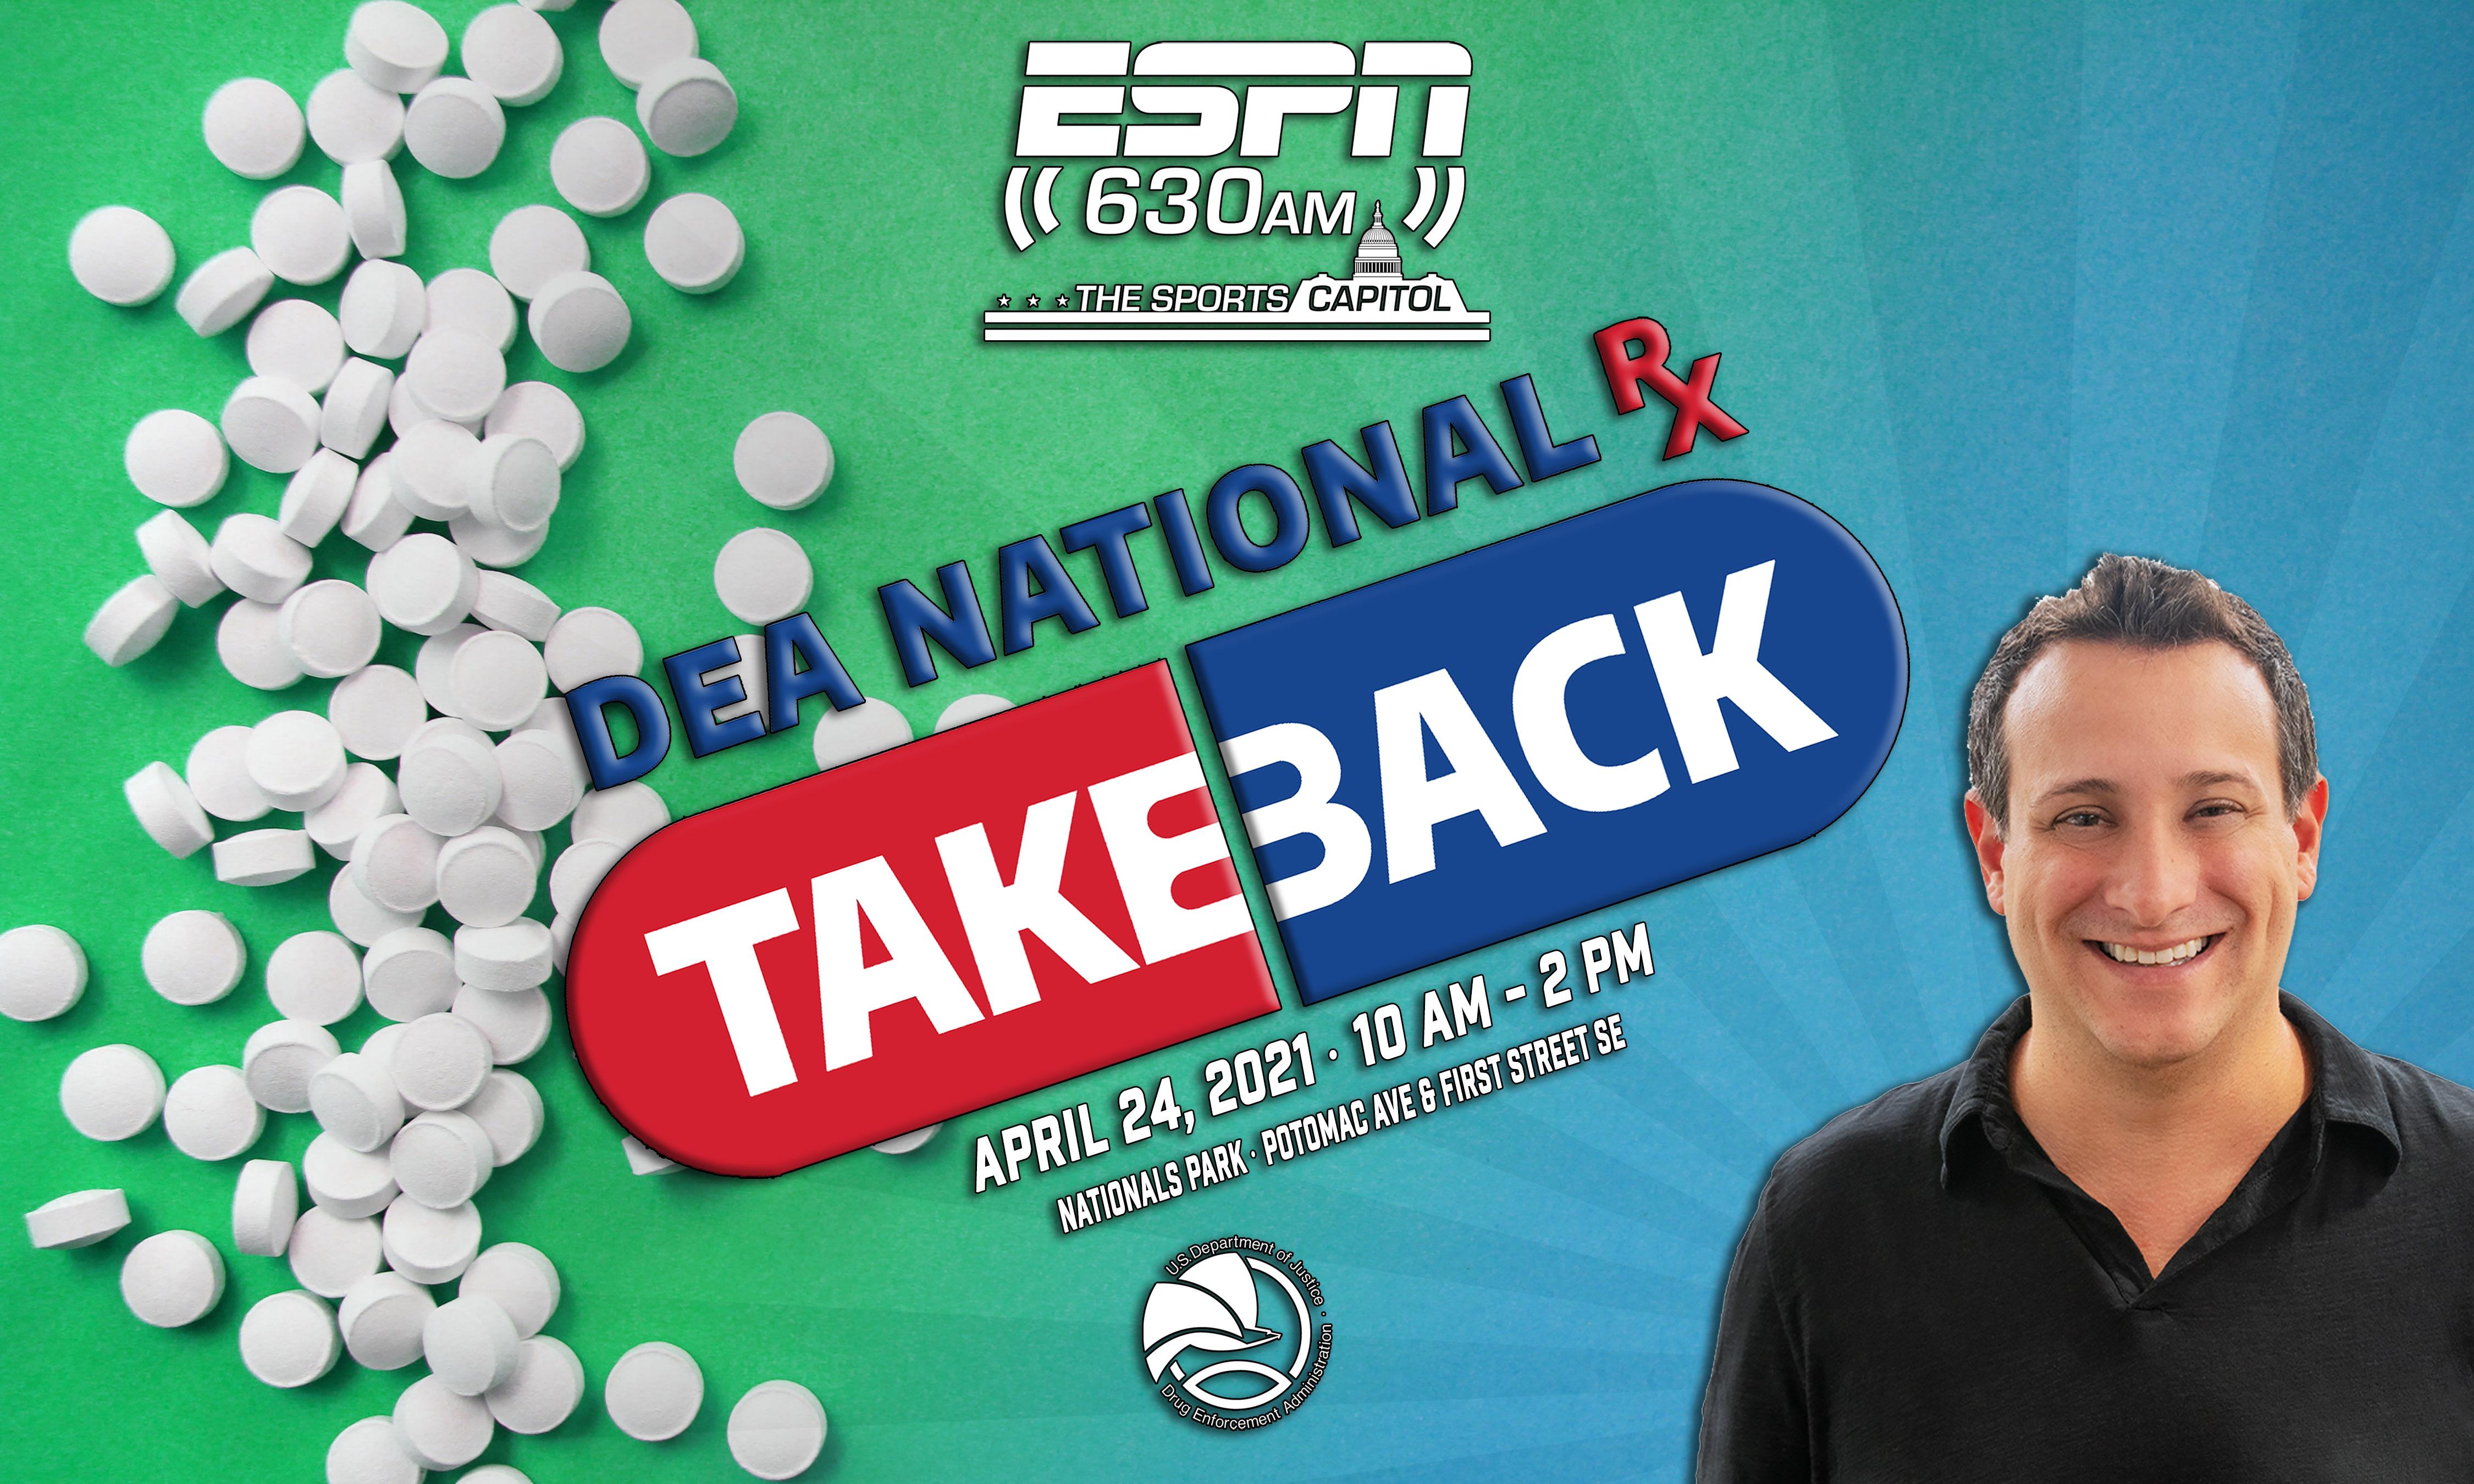 DEA National Takeback Event Art